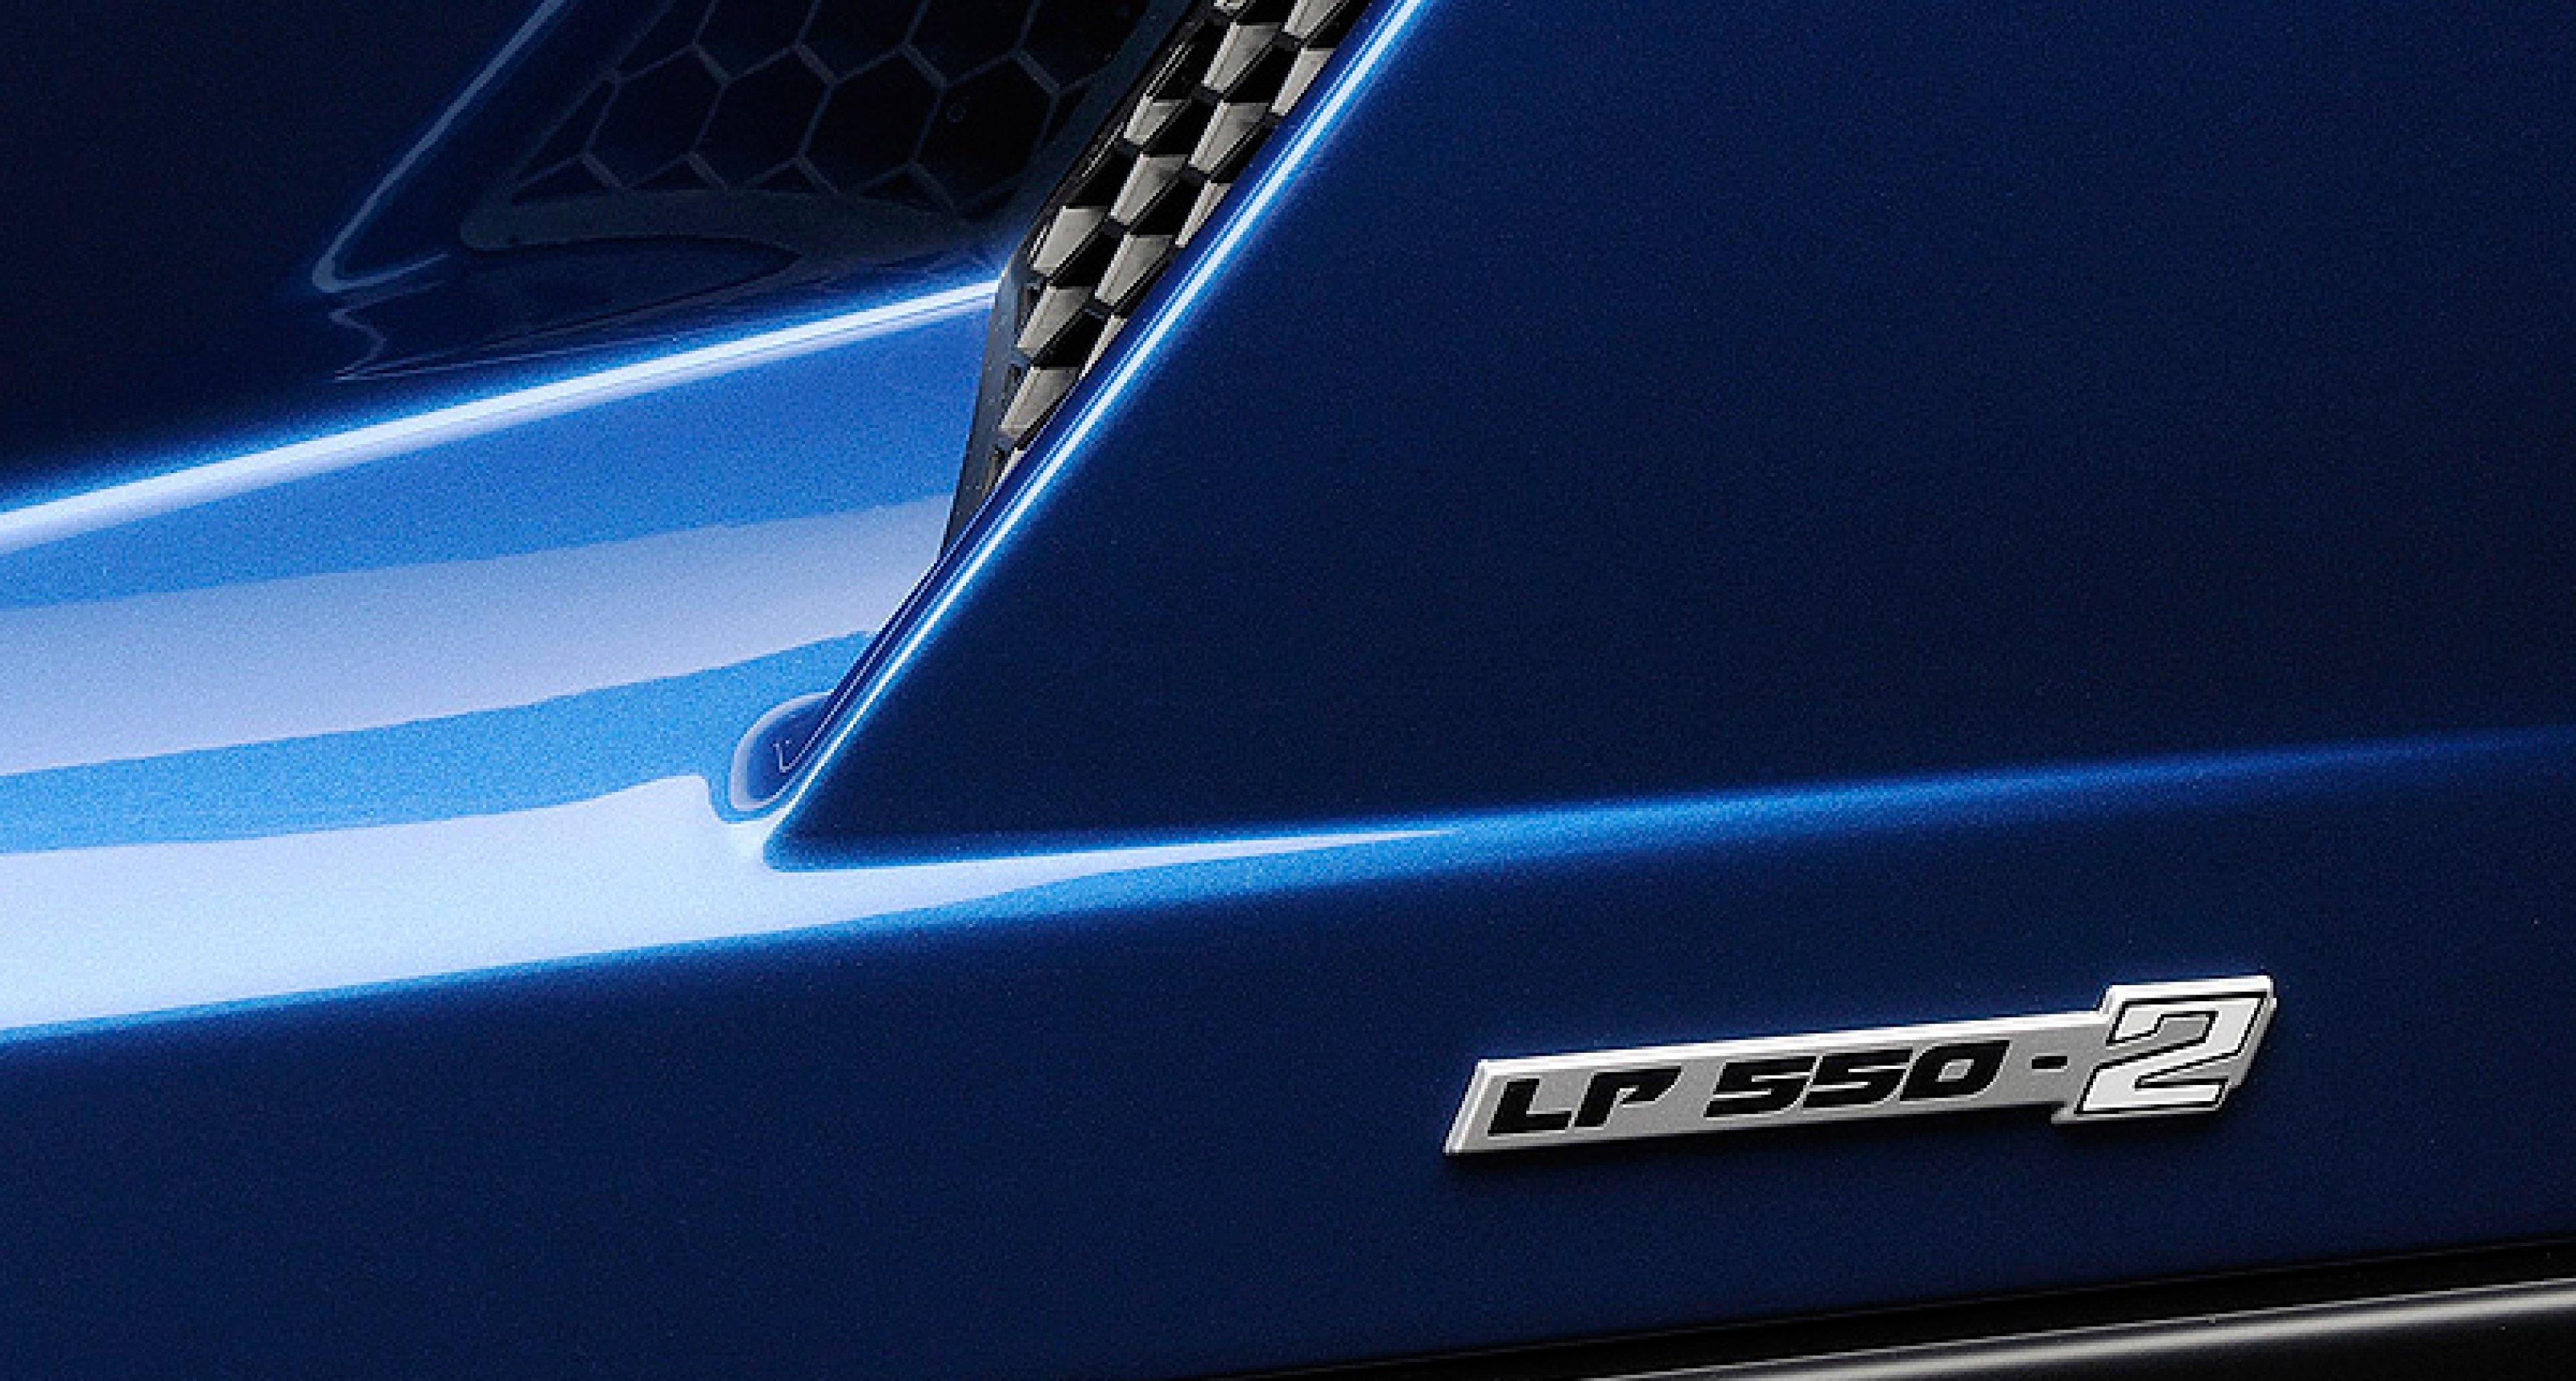 Lamborghini feiert mit neuem Gallardo LP550-2 Spyder in L.A.